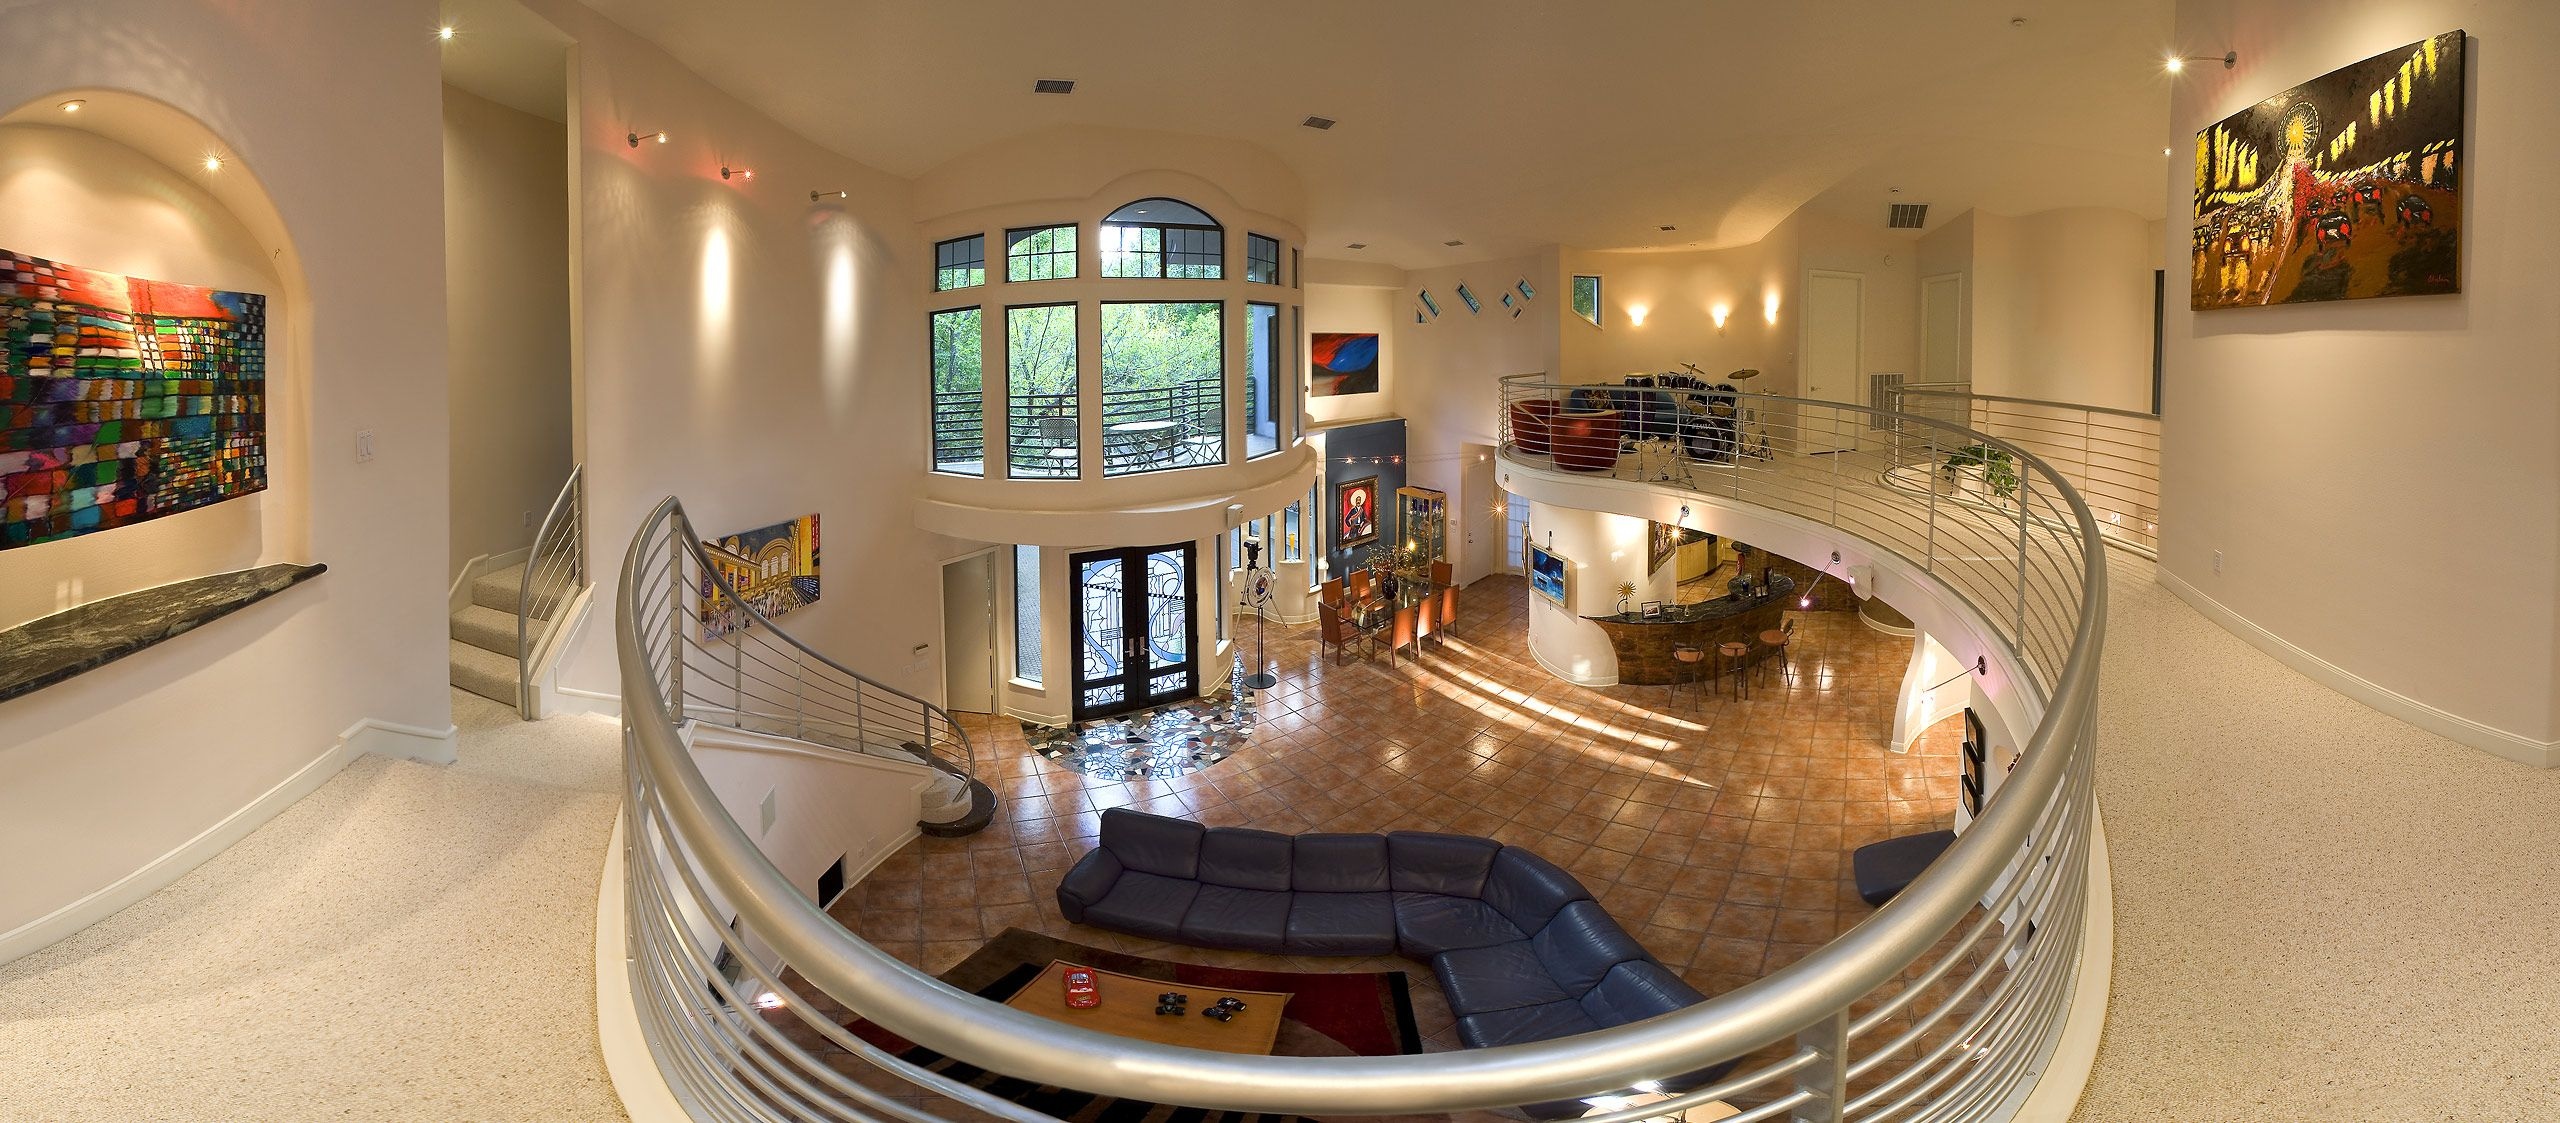 home_interior.jpg